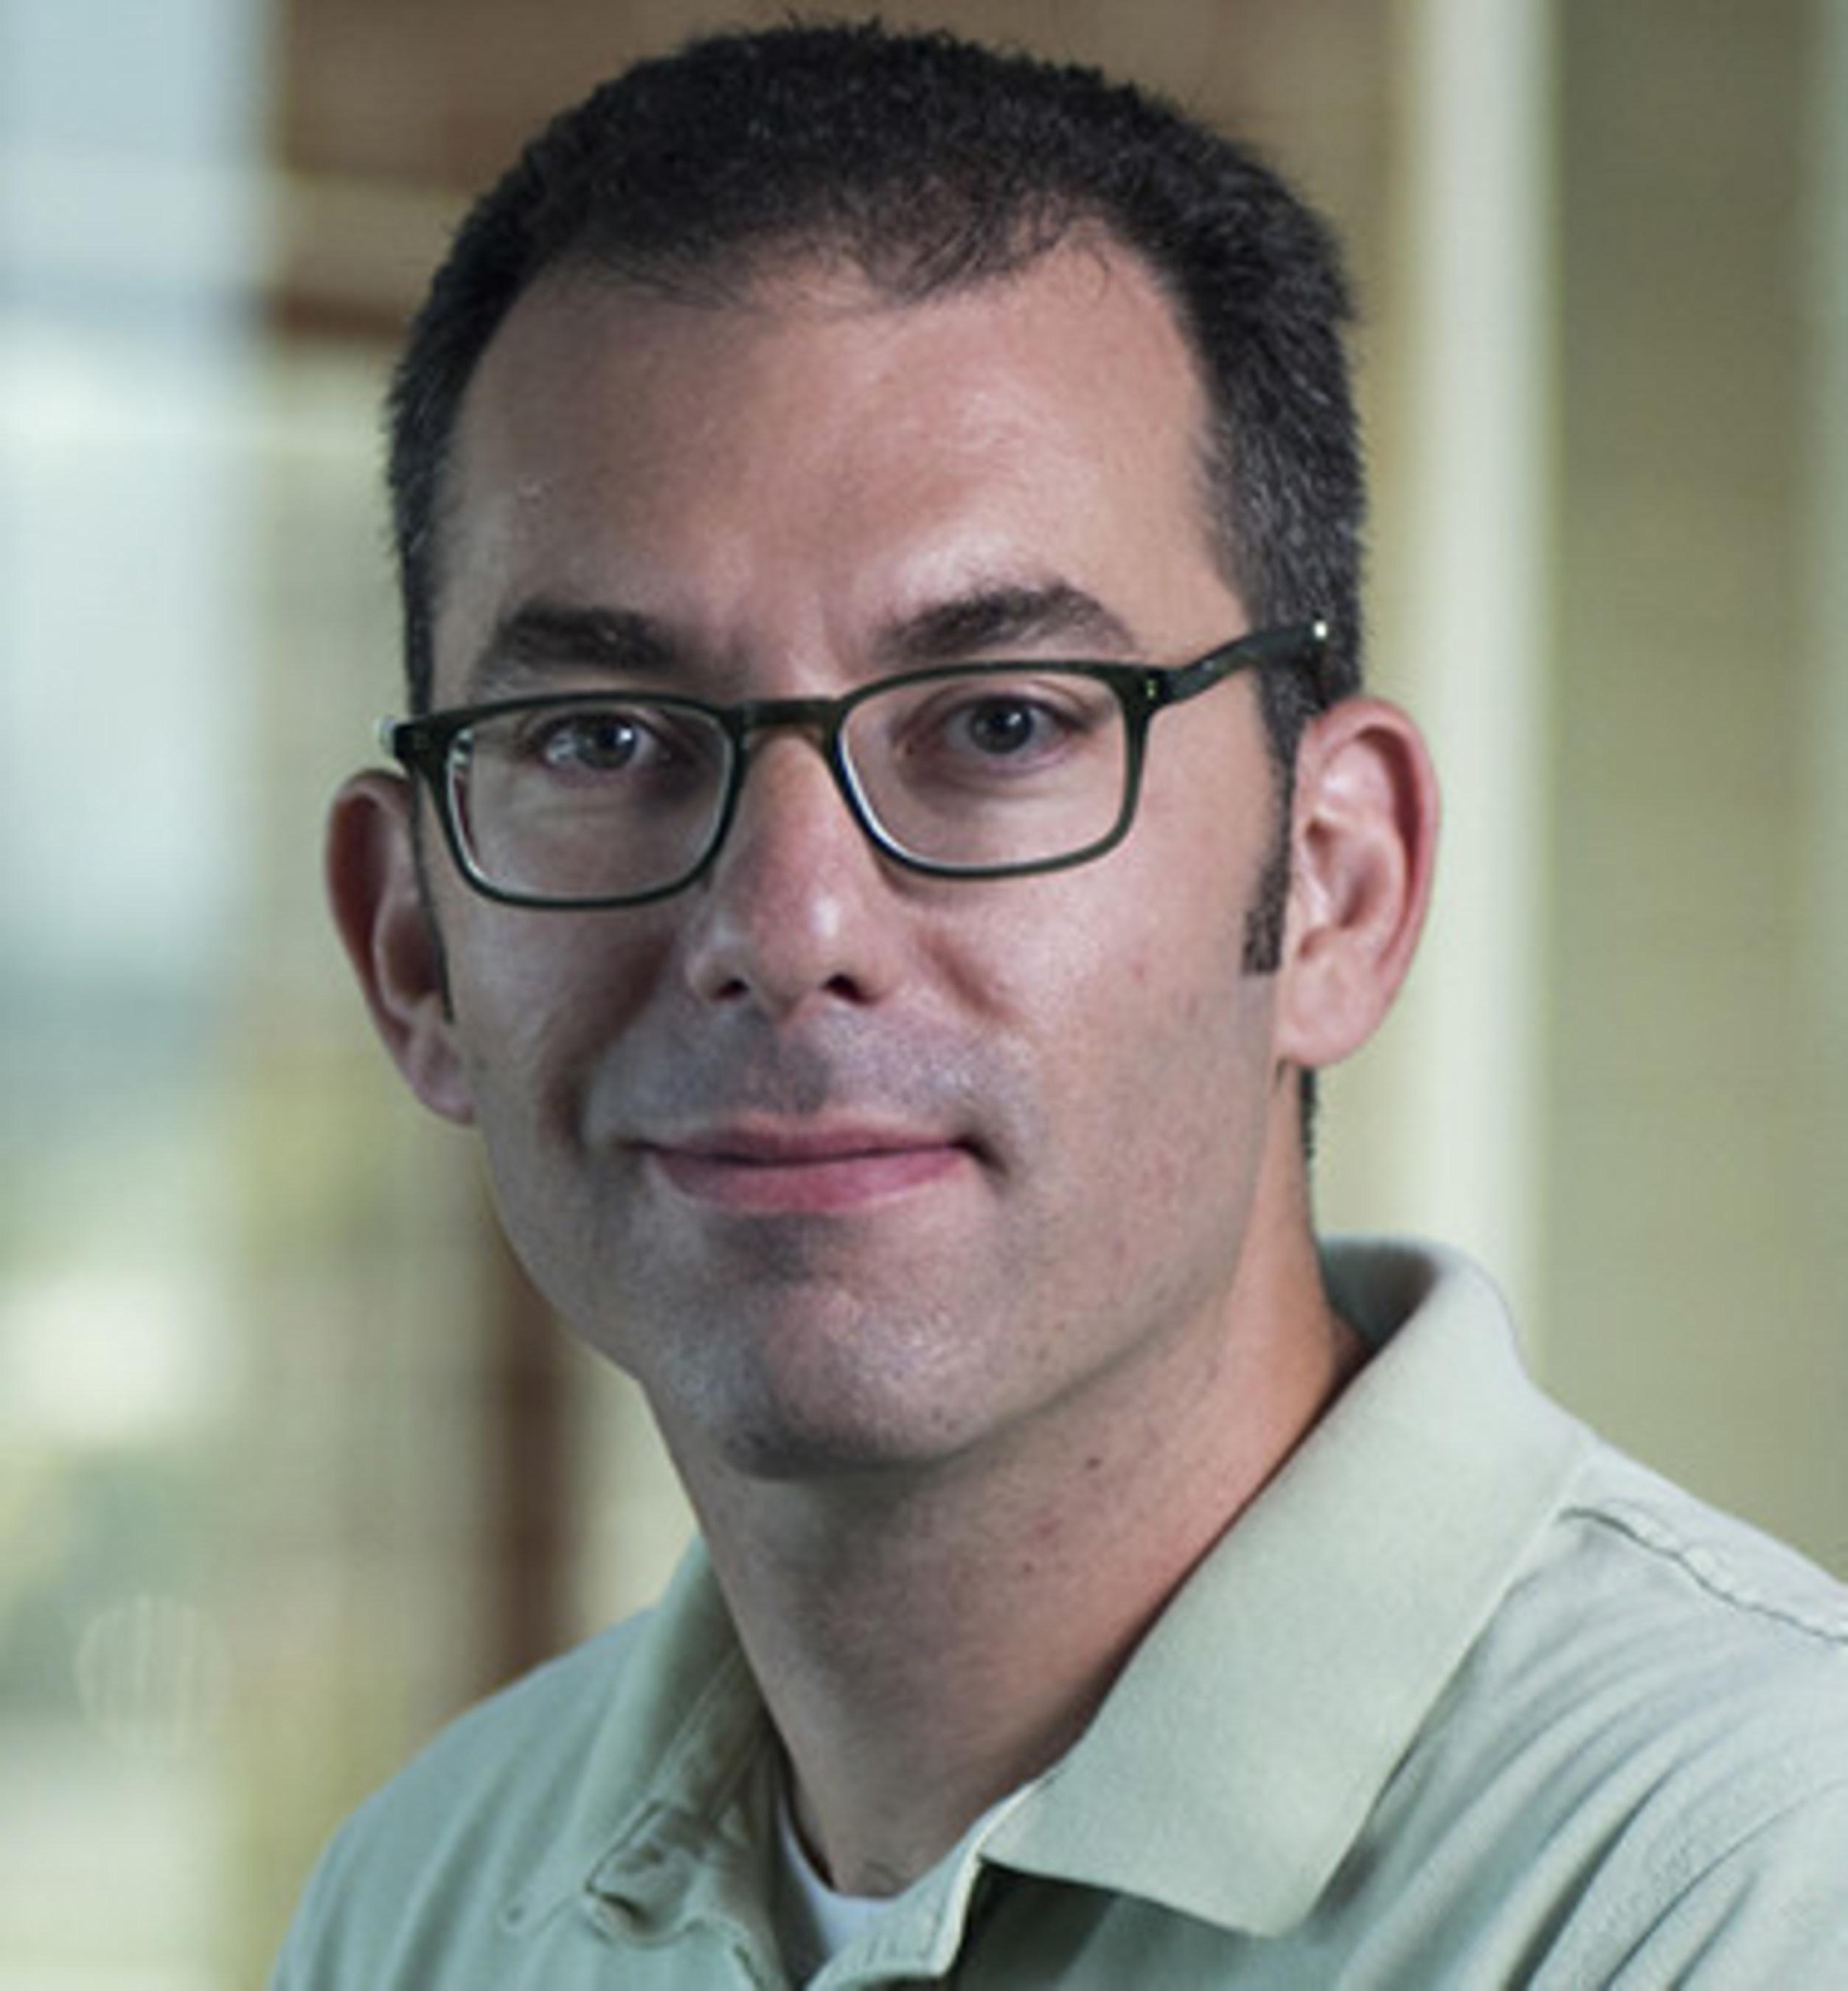 Lexumo CTO/Founder Chosen to Speak at IoT Security Summit